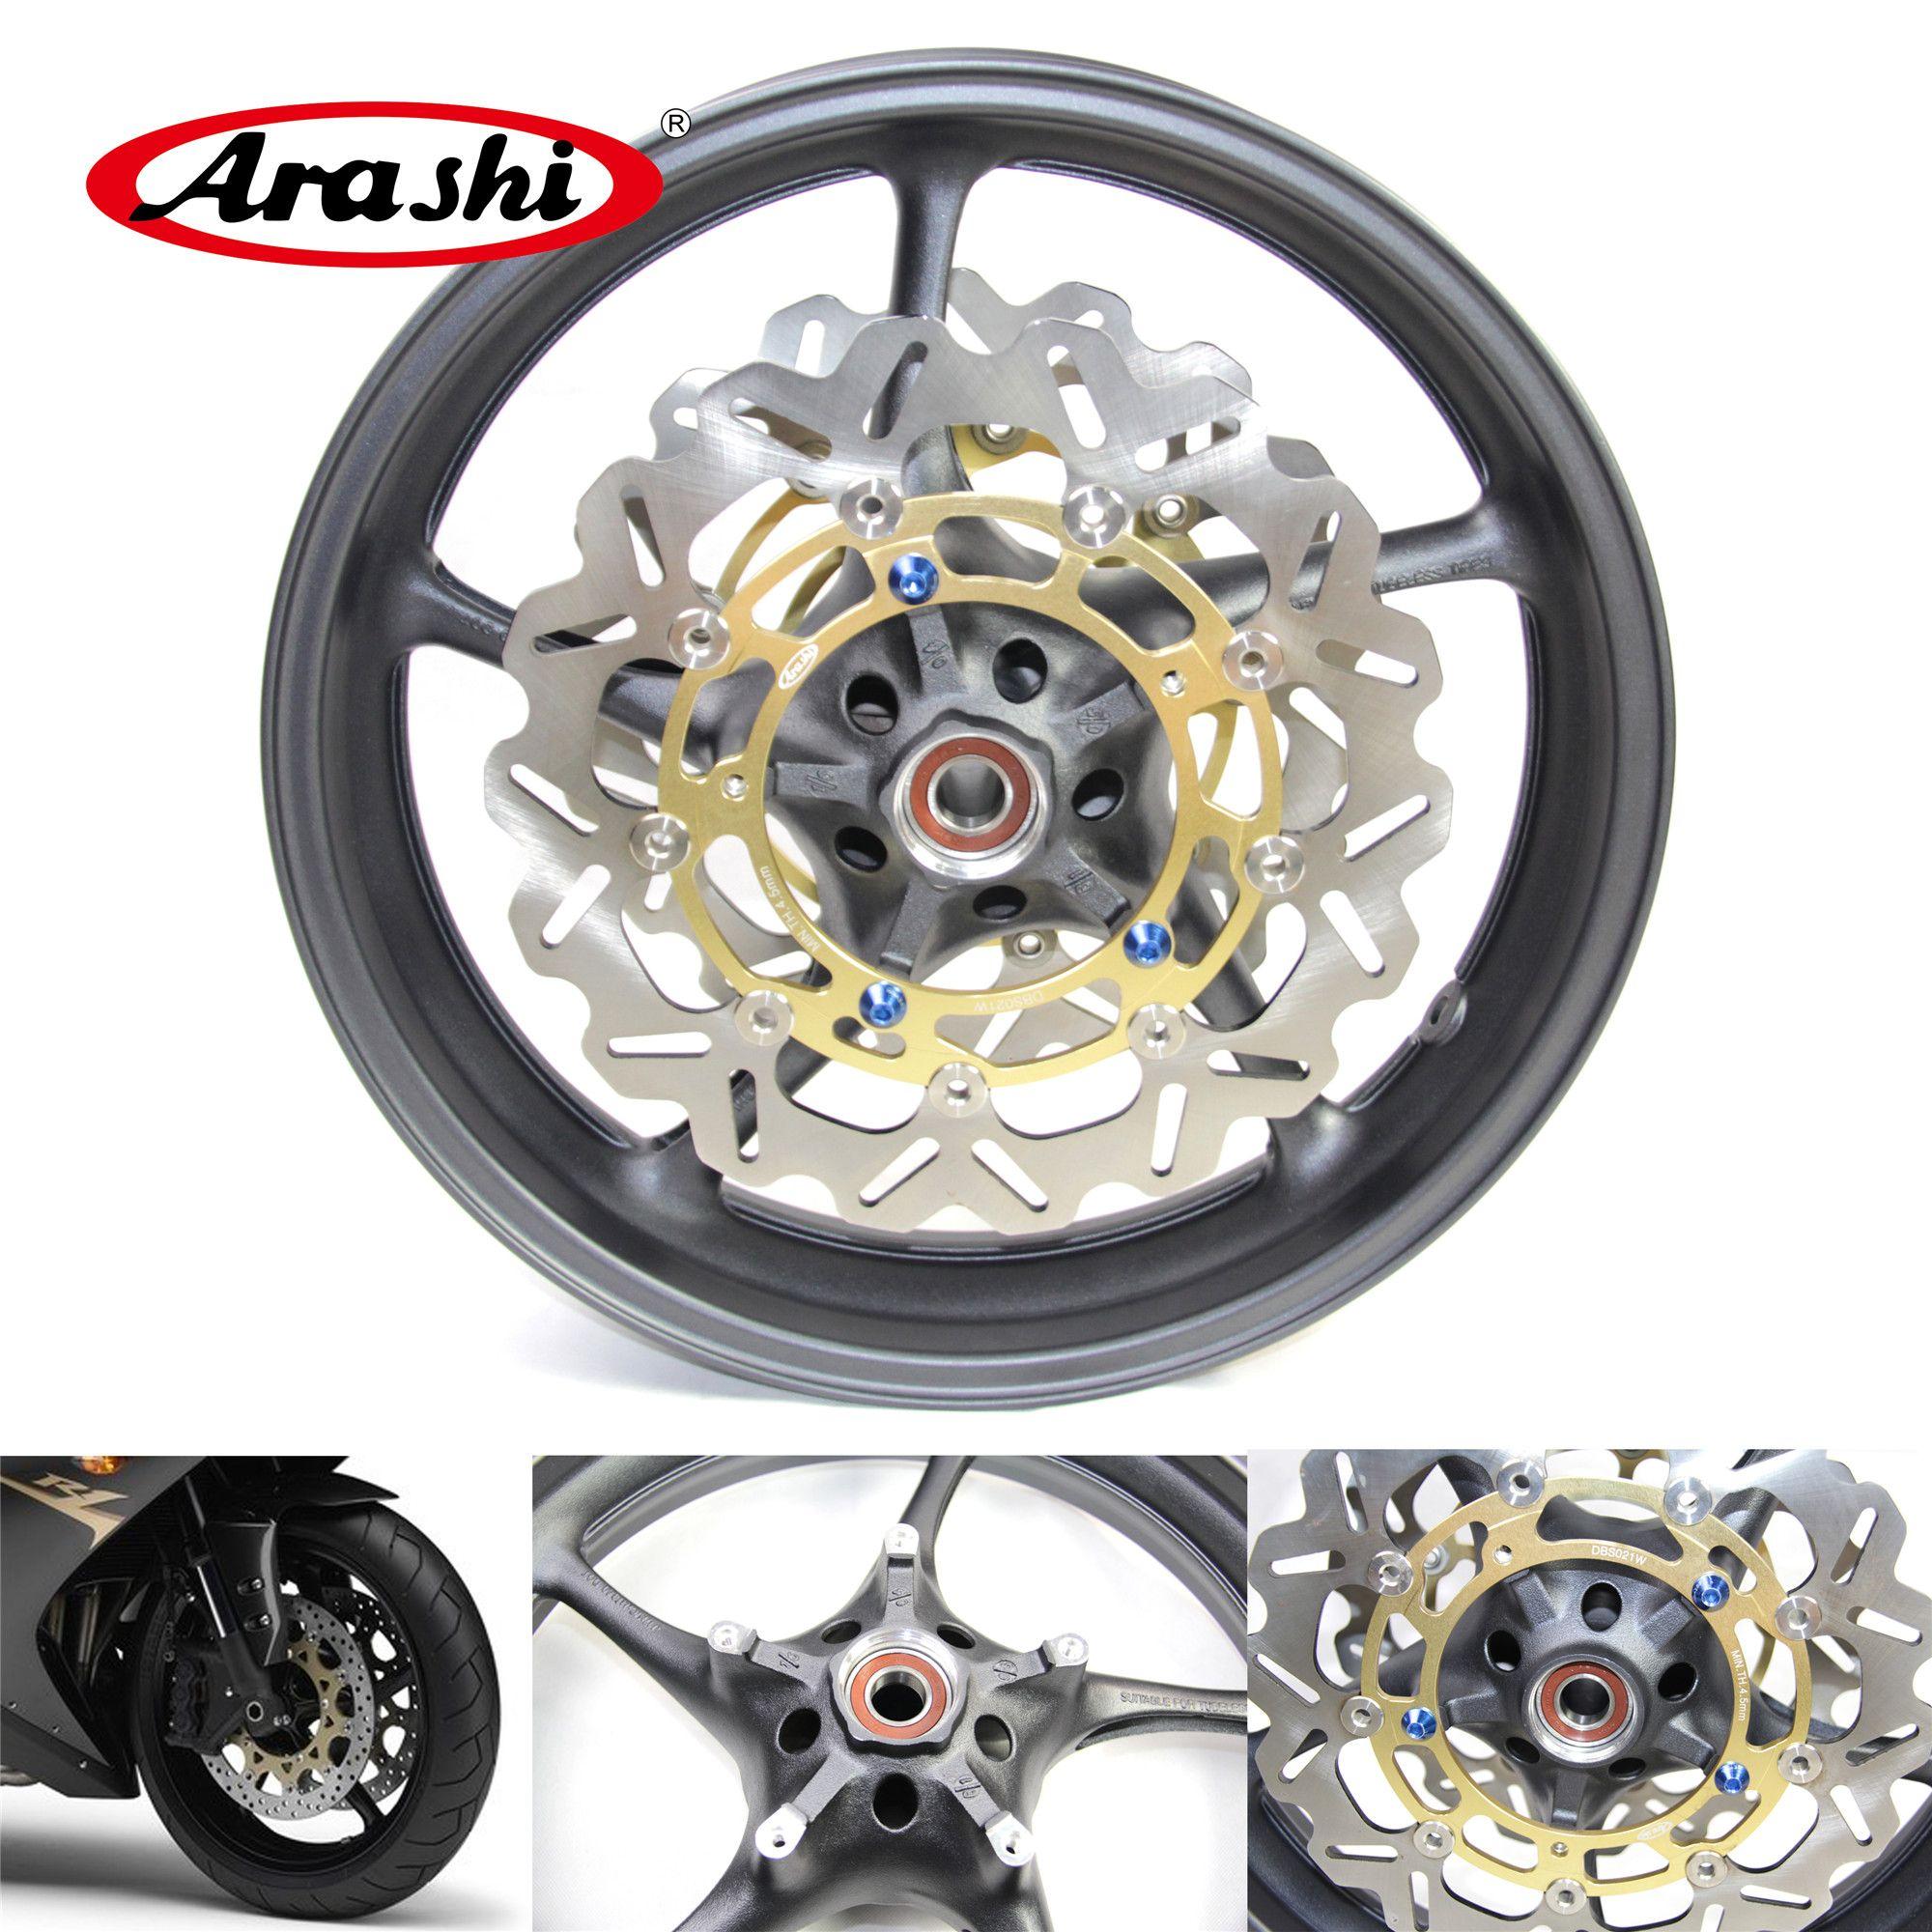 Arashi For Yamaha YZF R6 2006 - 2012 Front Wheel Rim Brake Disc Disk Rotor Motorcycle Parts 2007 2008 2009 2010 2011 YZF-R1 YZF-R6